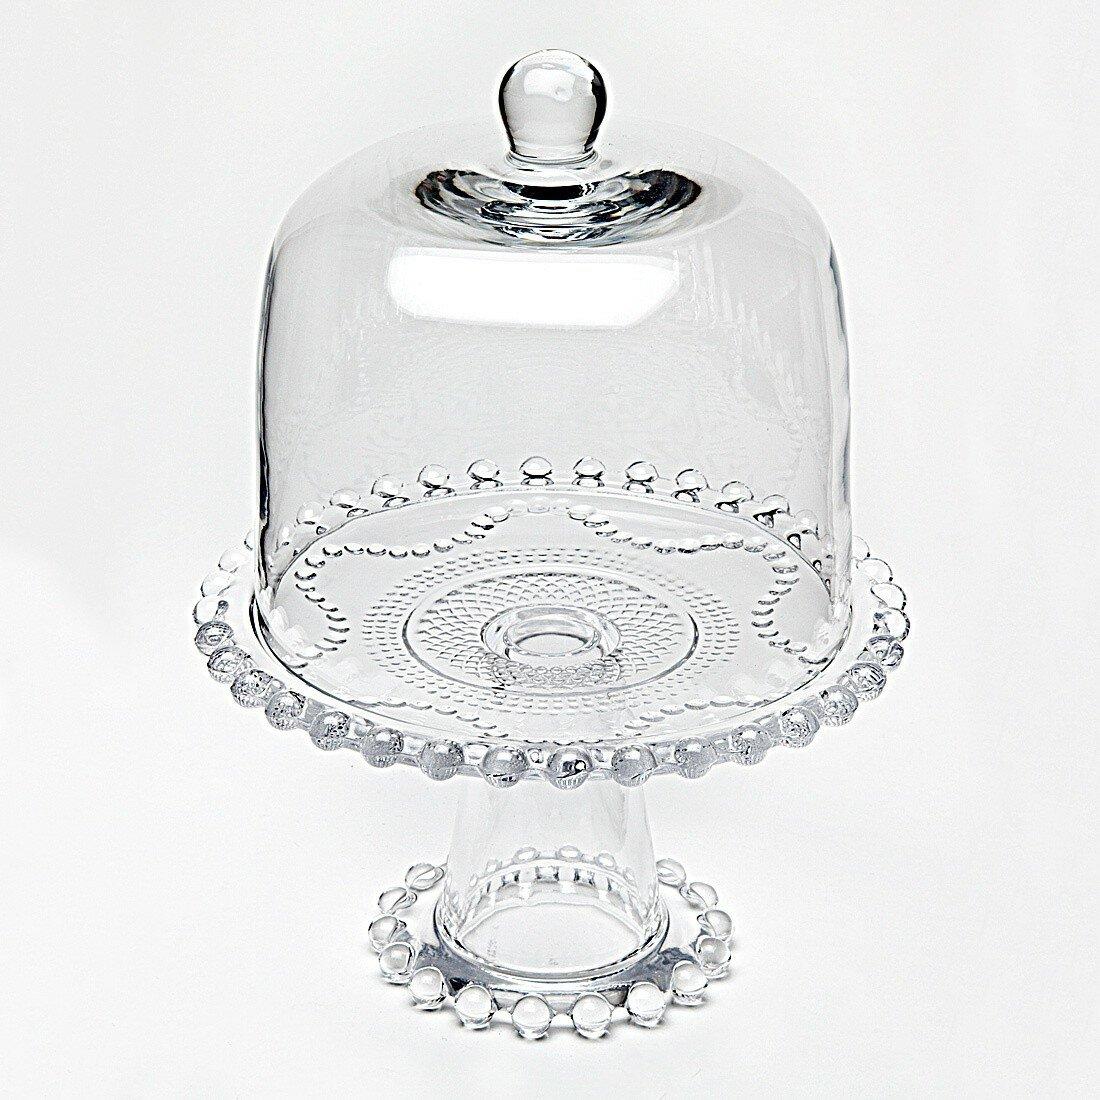 Godinger Silver Cake Stand